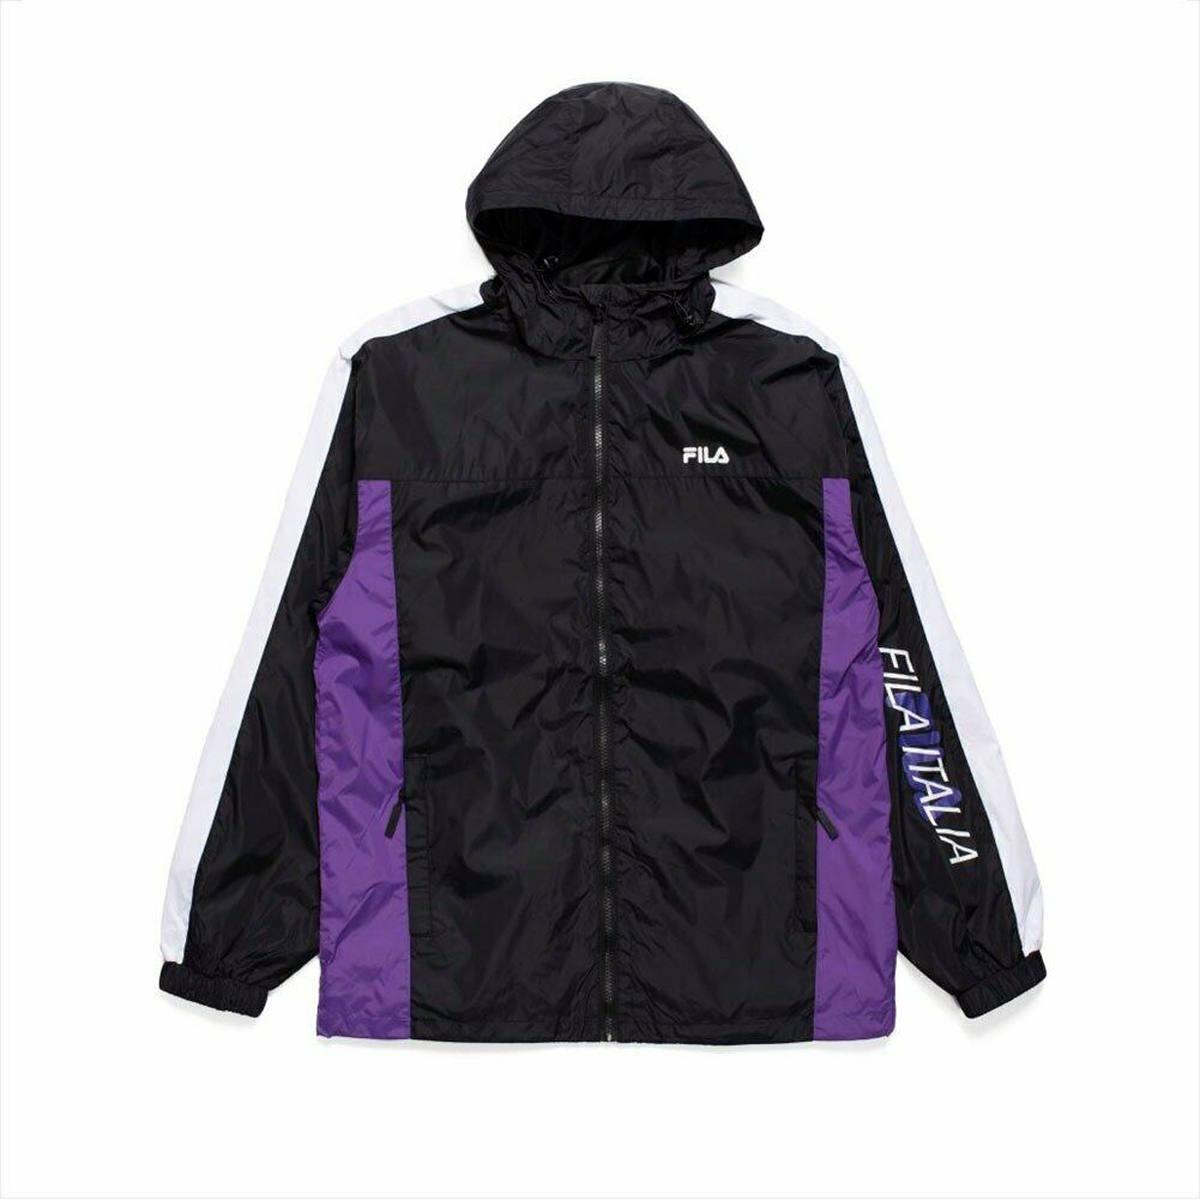 Fila|Men Cappy Woven jacket